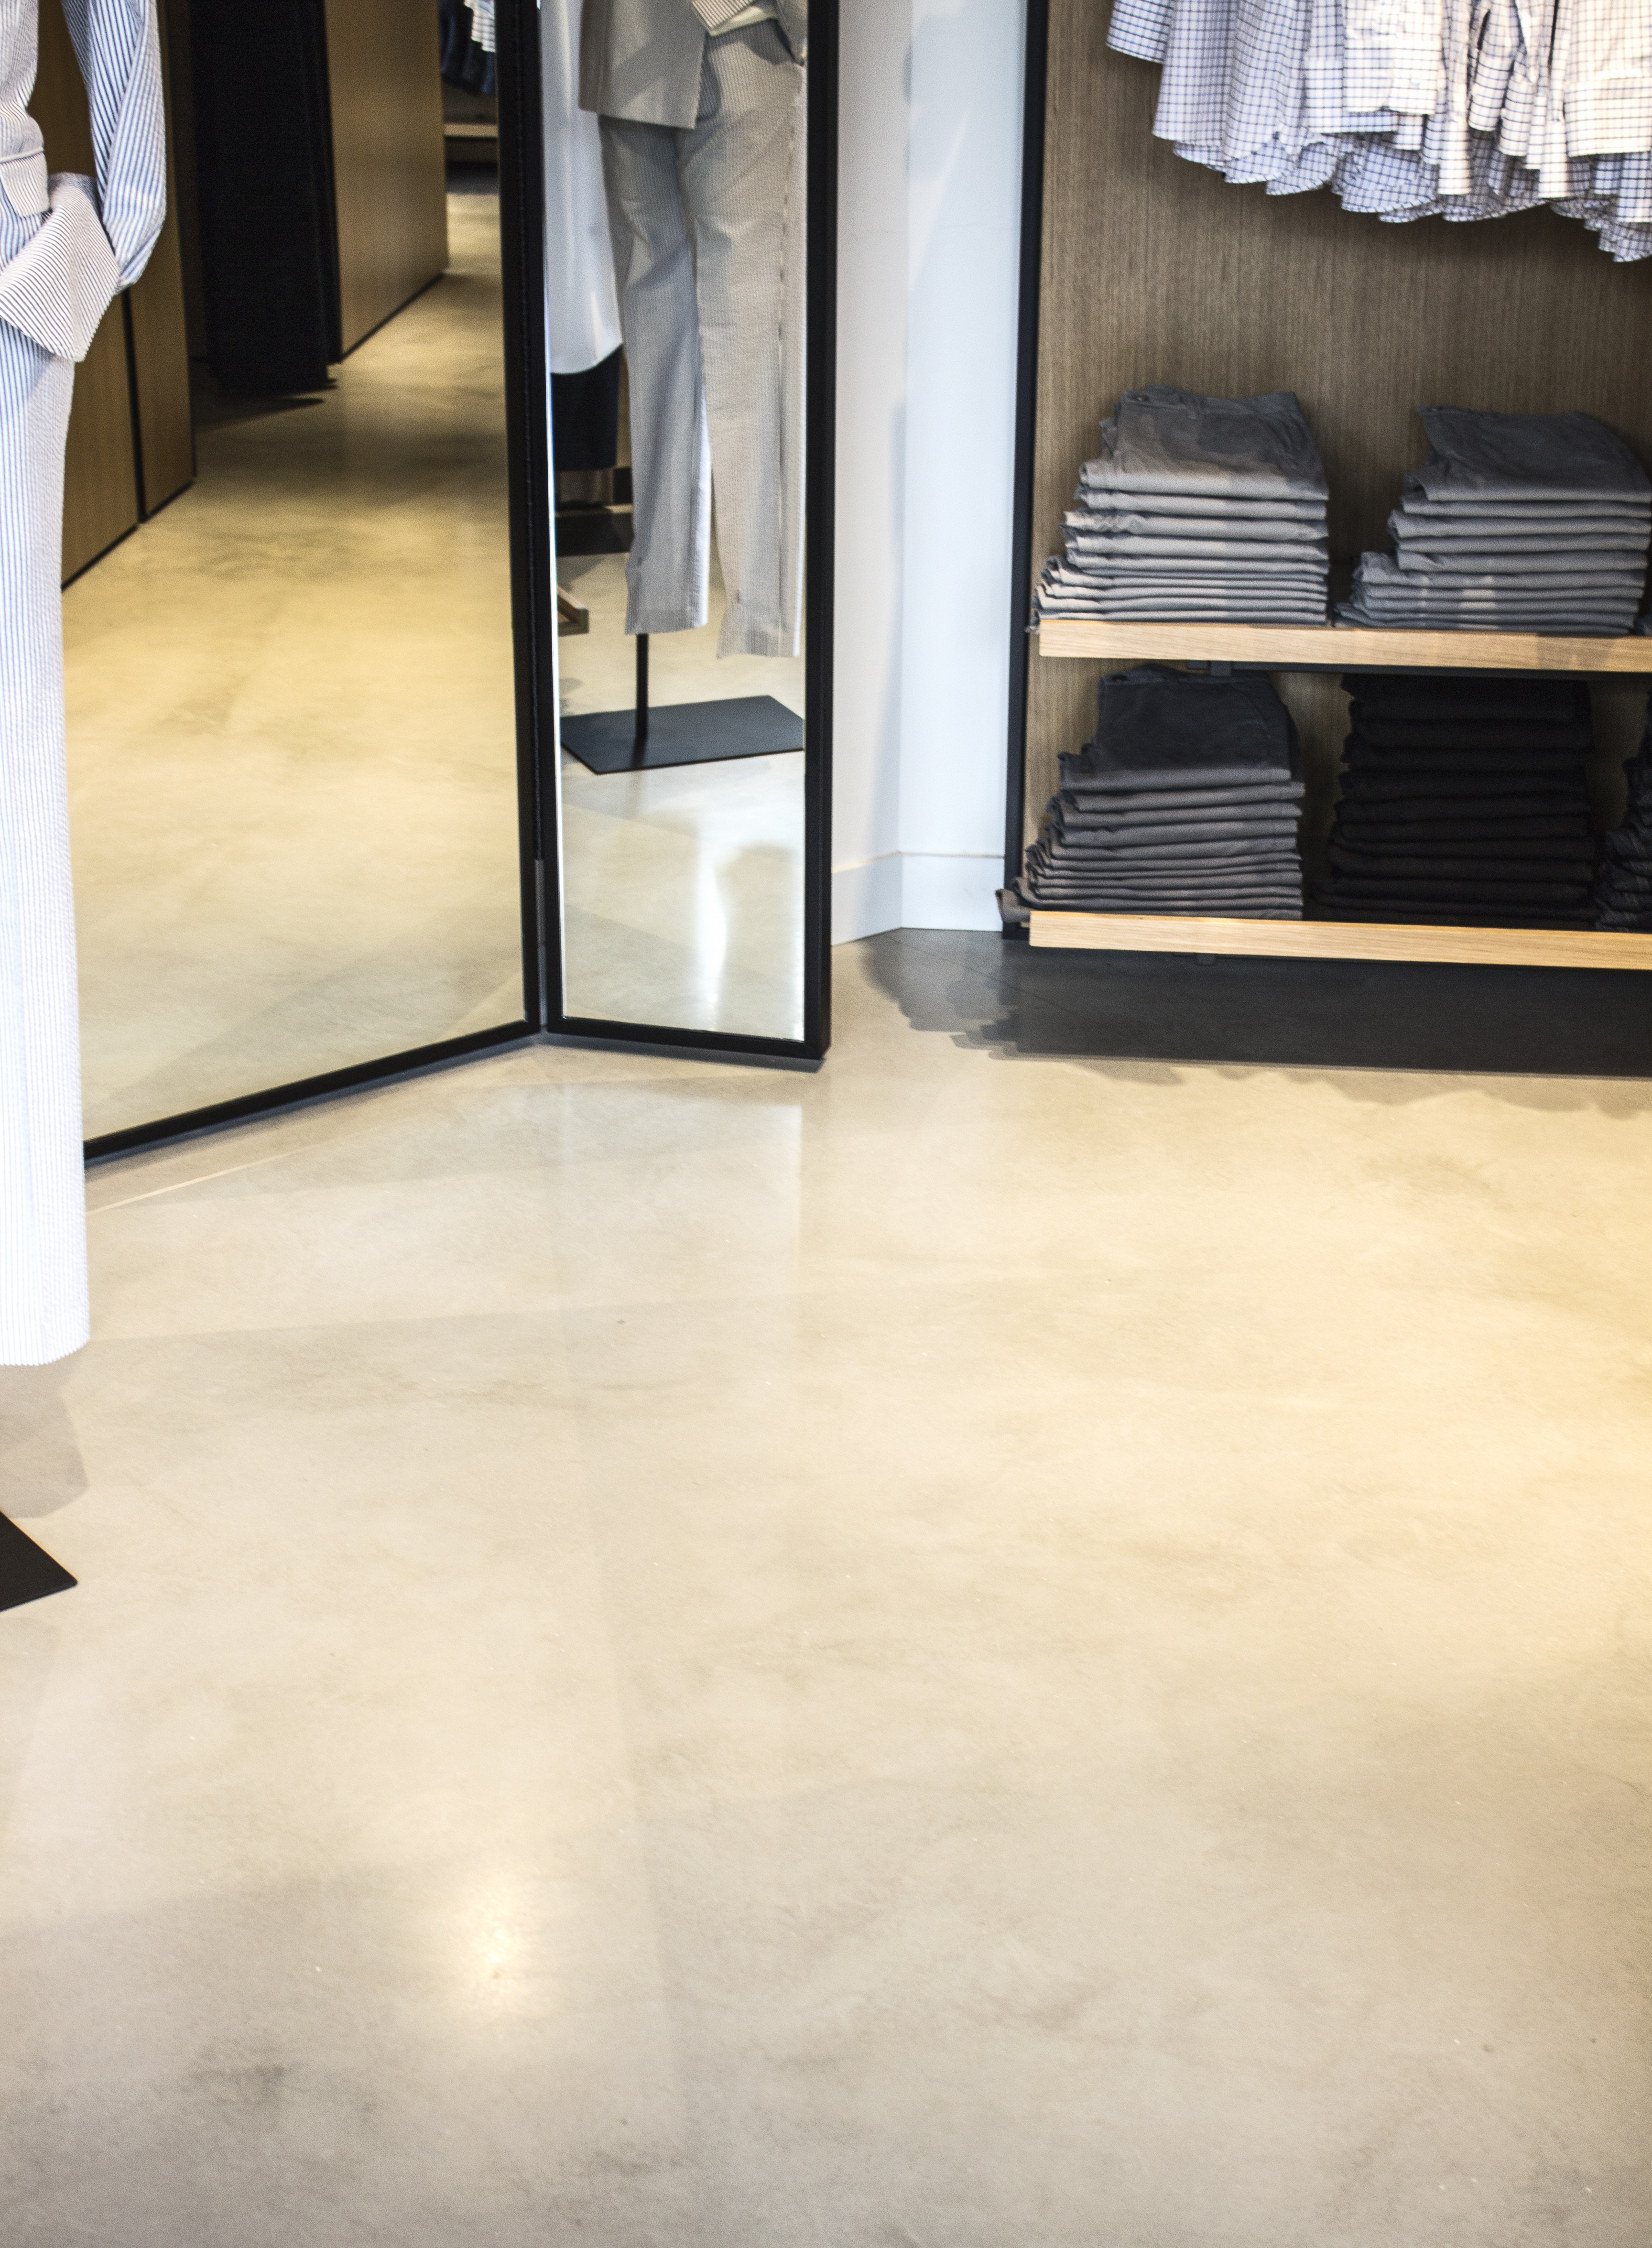 Polished Concrete Floor Bonobos Store